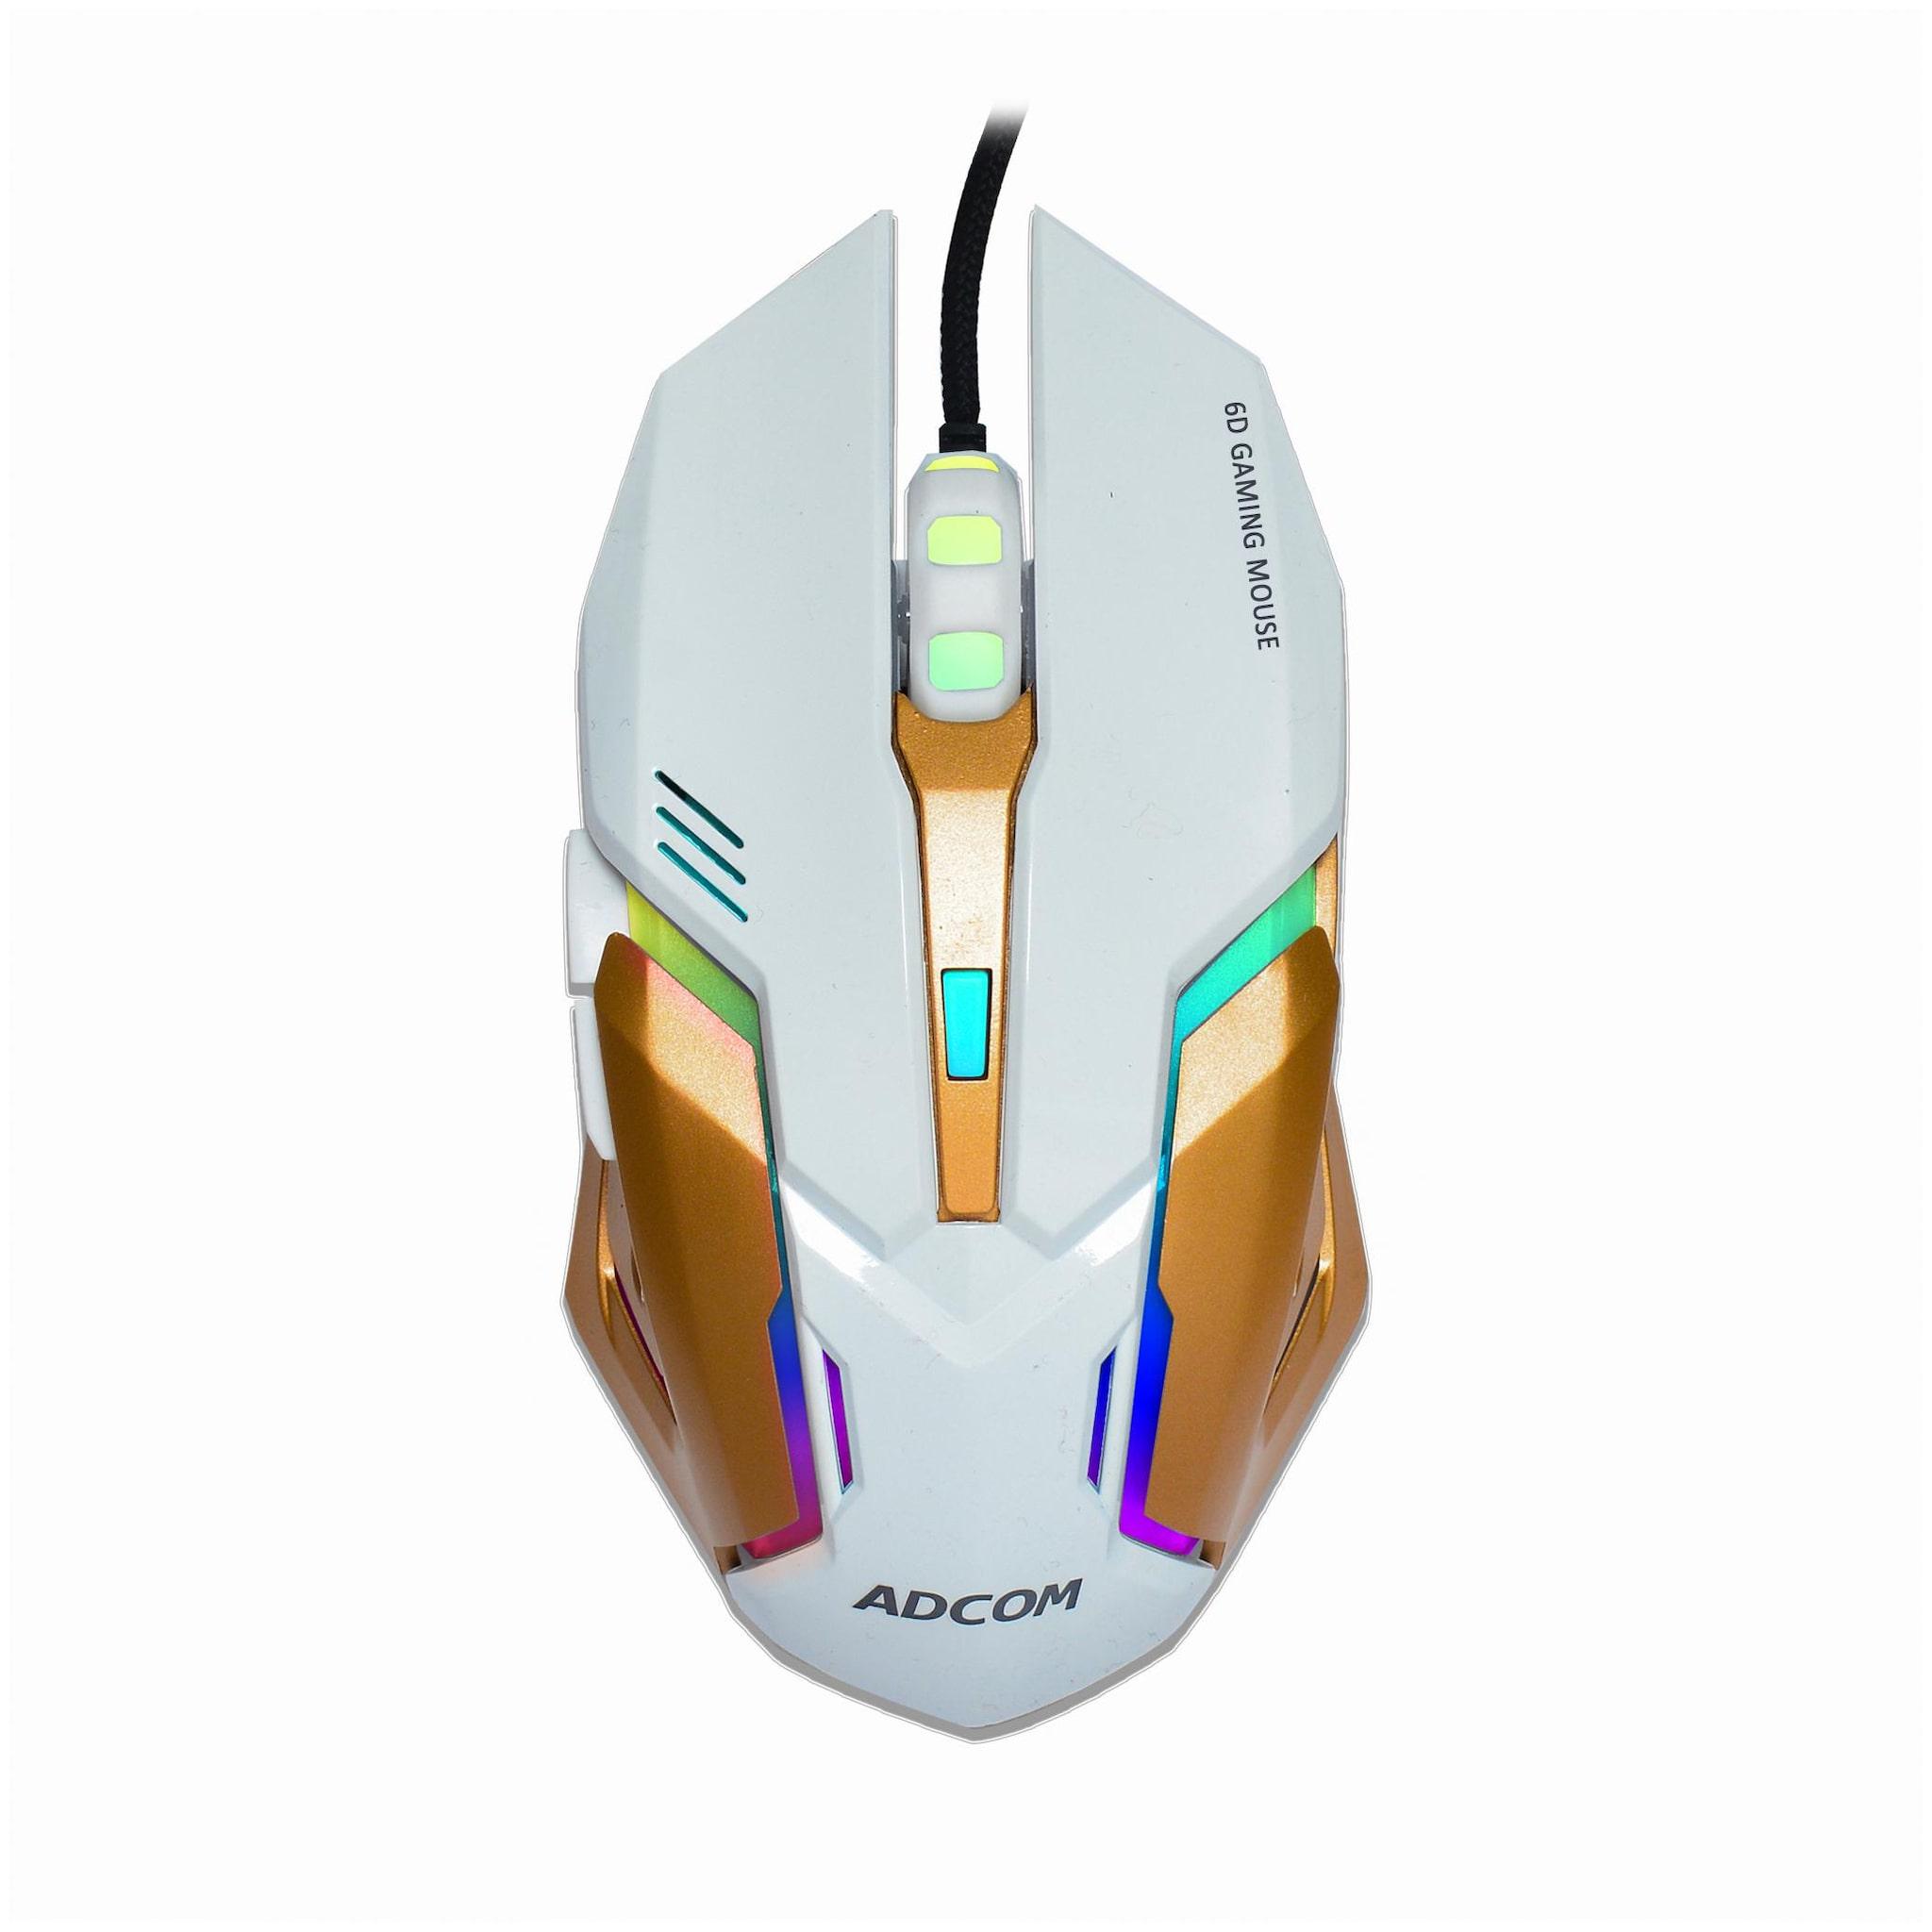 Adcom AD 5766 Wired Mouse   White   by Adcom